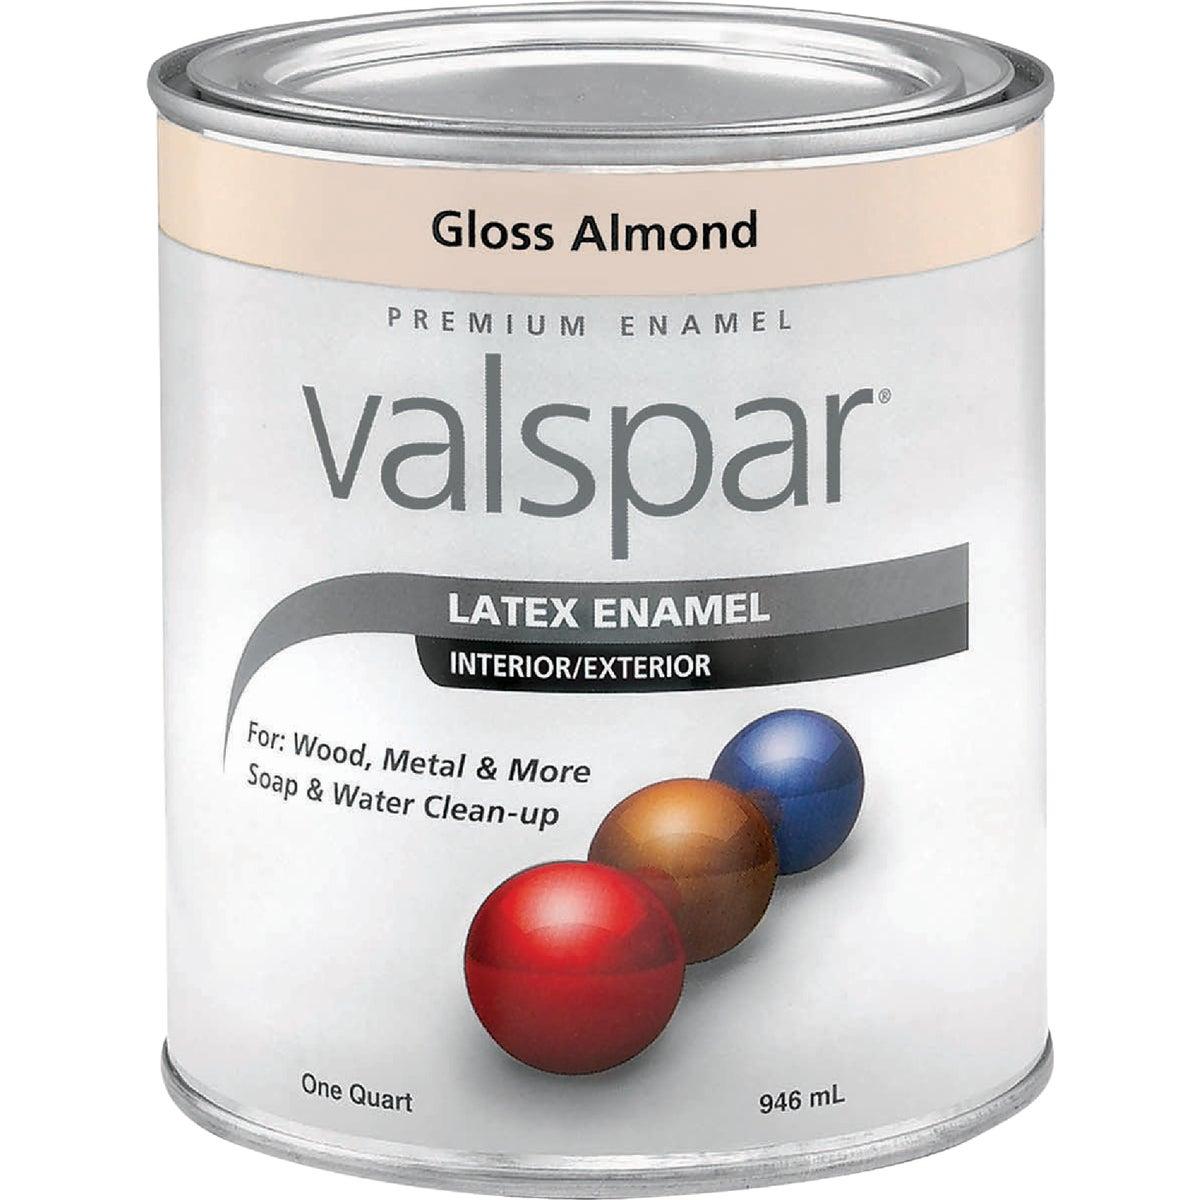 LTX ALMOND ENAMEL - 410.0065004.005 by Valspar Corp